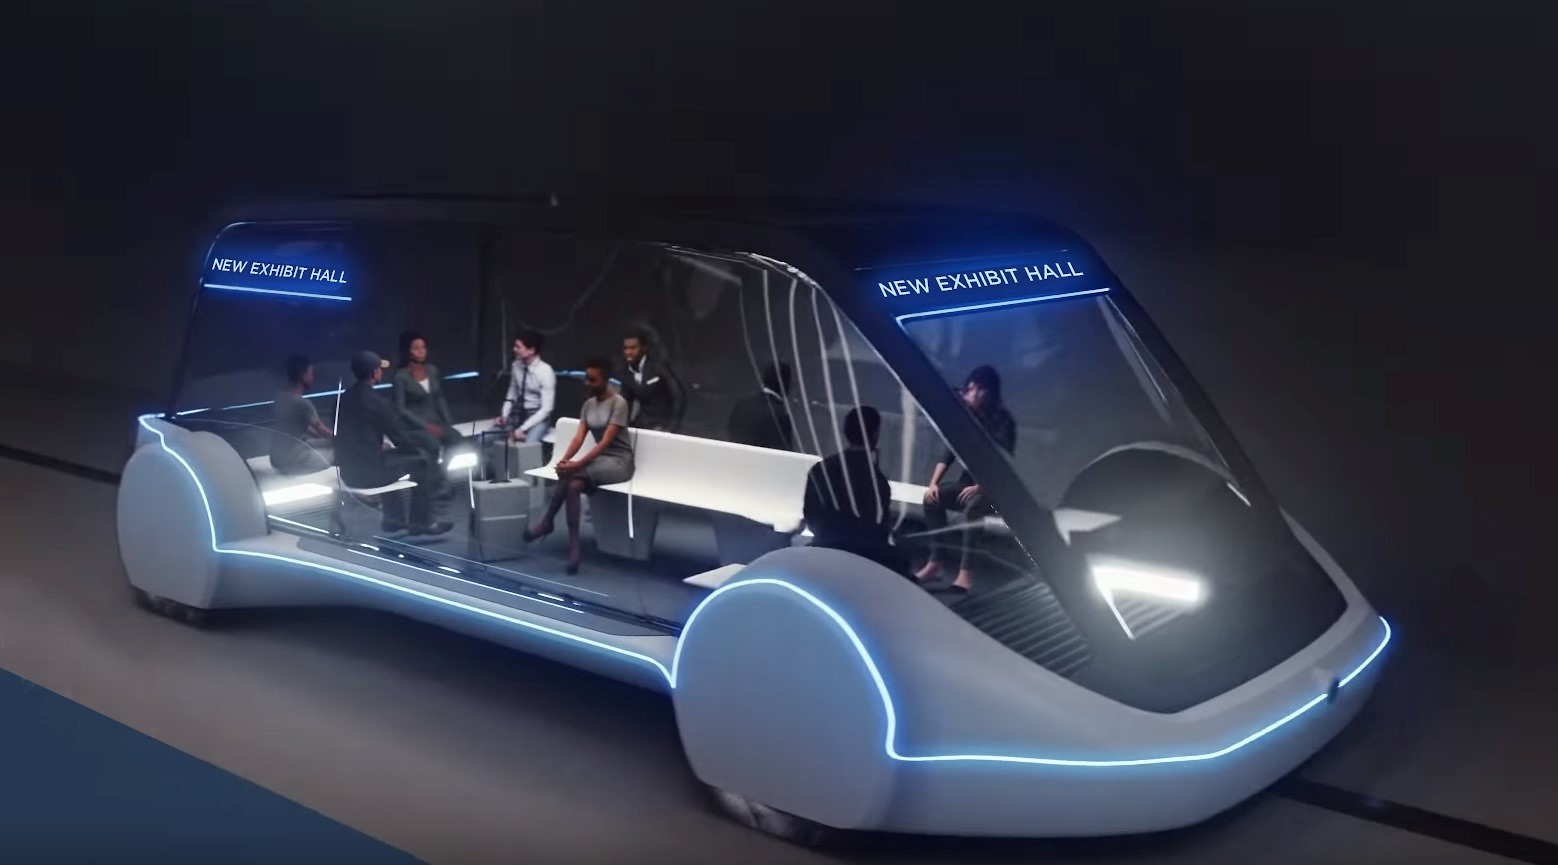 High-Occupancy Autonomous Electric Vehicle (AEV) running between Exhibit Halls_1551877585155.jpg.jpg